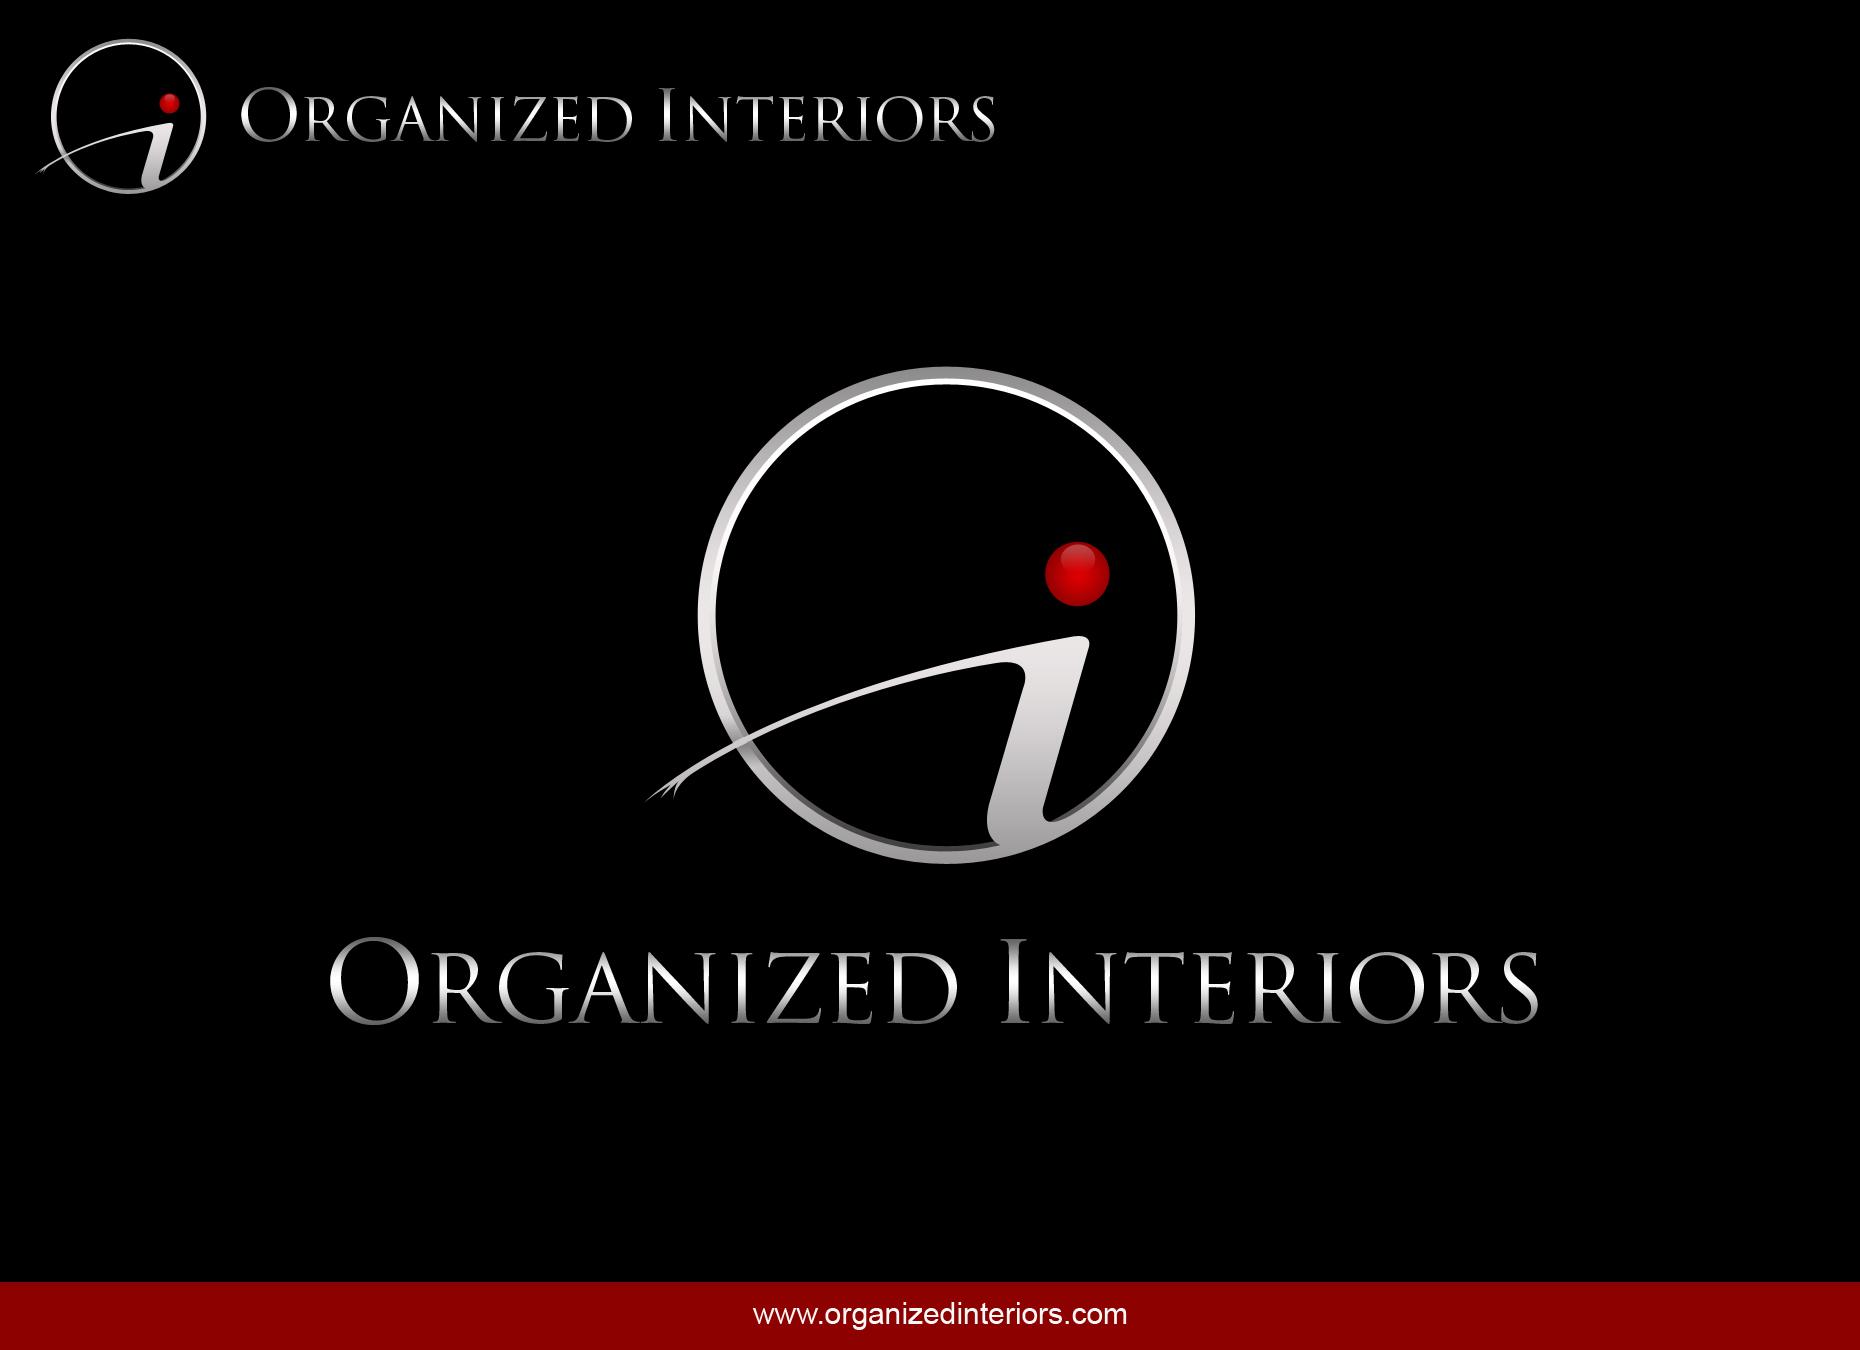 Logo Design by omARTist - Entry No. 121 in the Logo Design Contest Imaginative Logo Design for Organized Interiors.